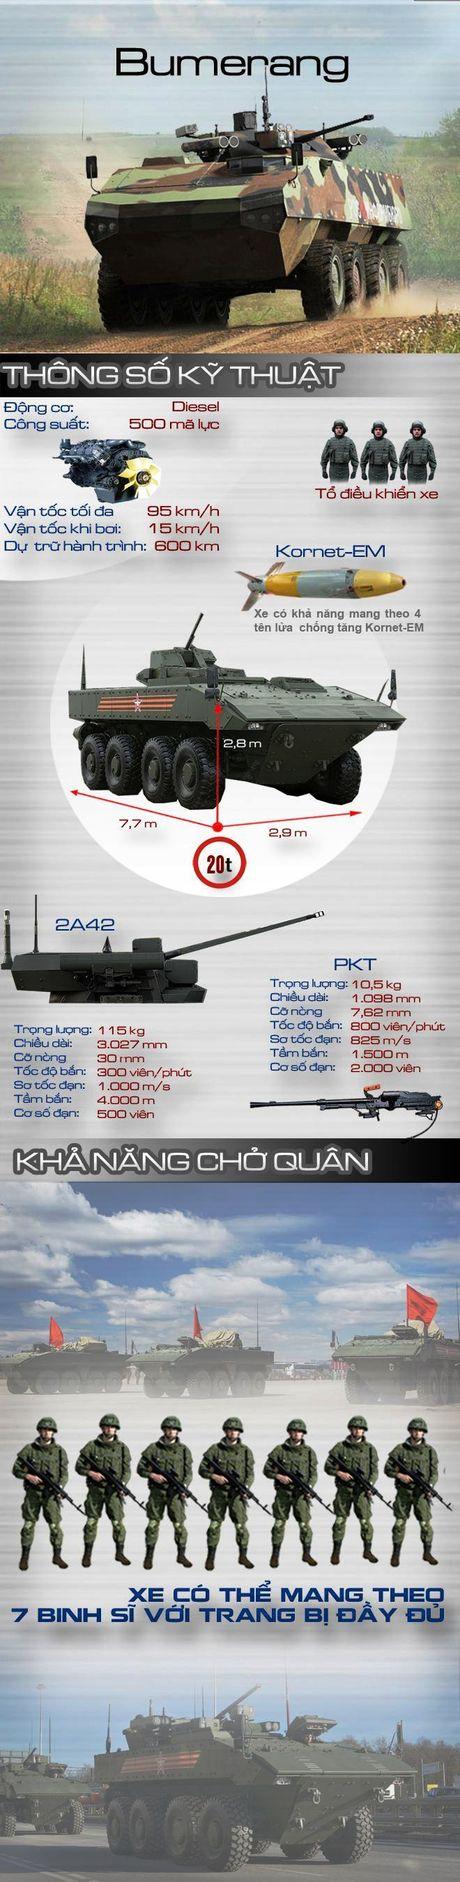 Boomerang - 'Voi thep' thay the huyen thoai BTR-80 cua Nga - Anh 1